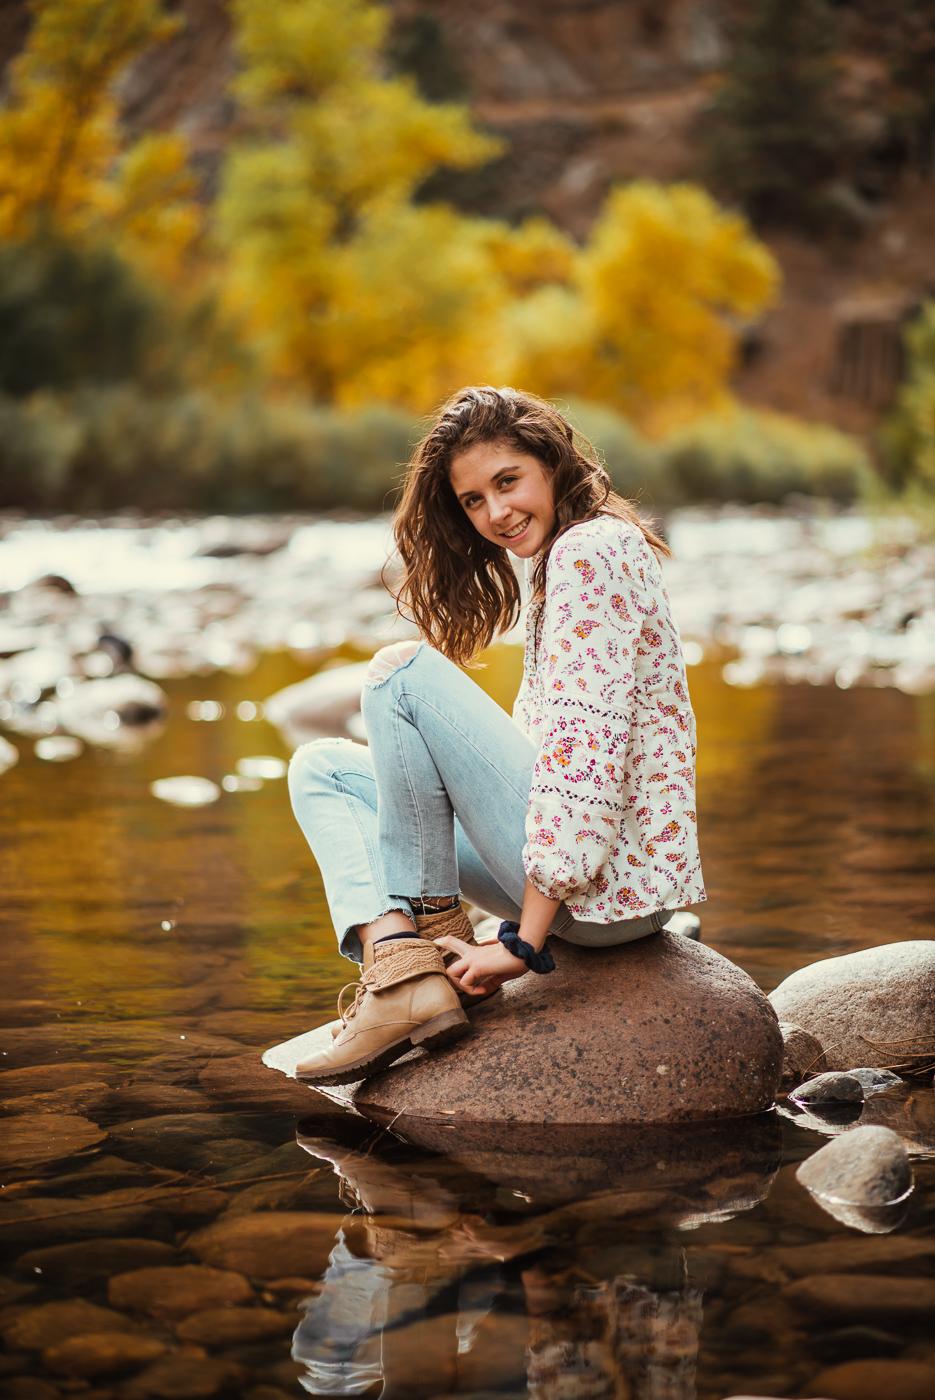 PHOCO Photography Fort Collins Colorado Senior Portraits Fall Gateway Natural Area Yellow Fedora Autumn River-3.jpg